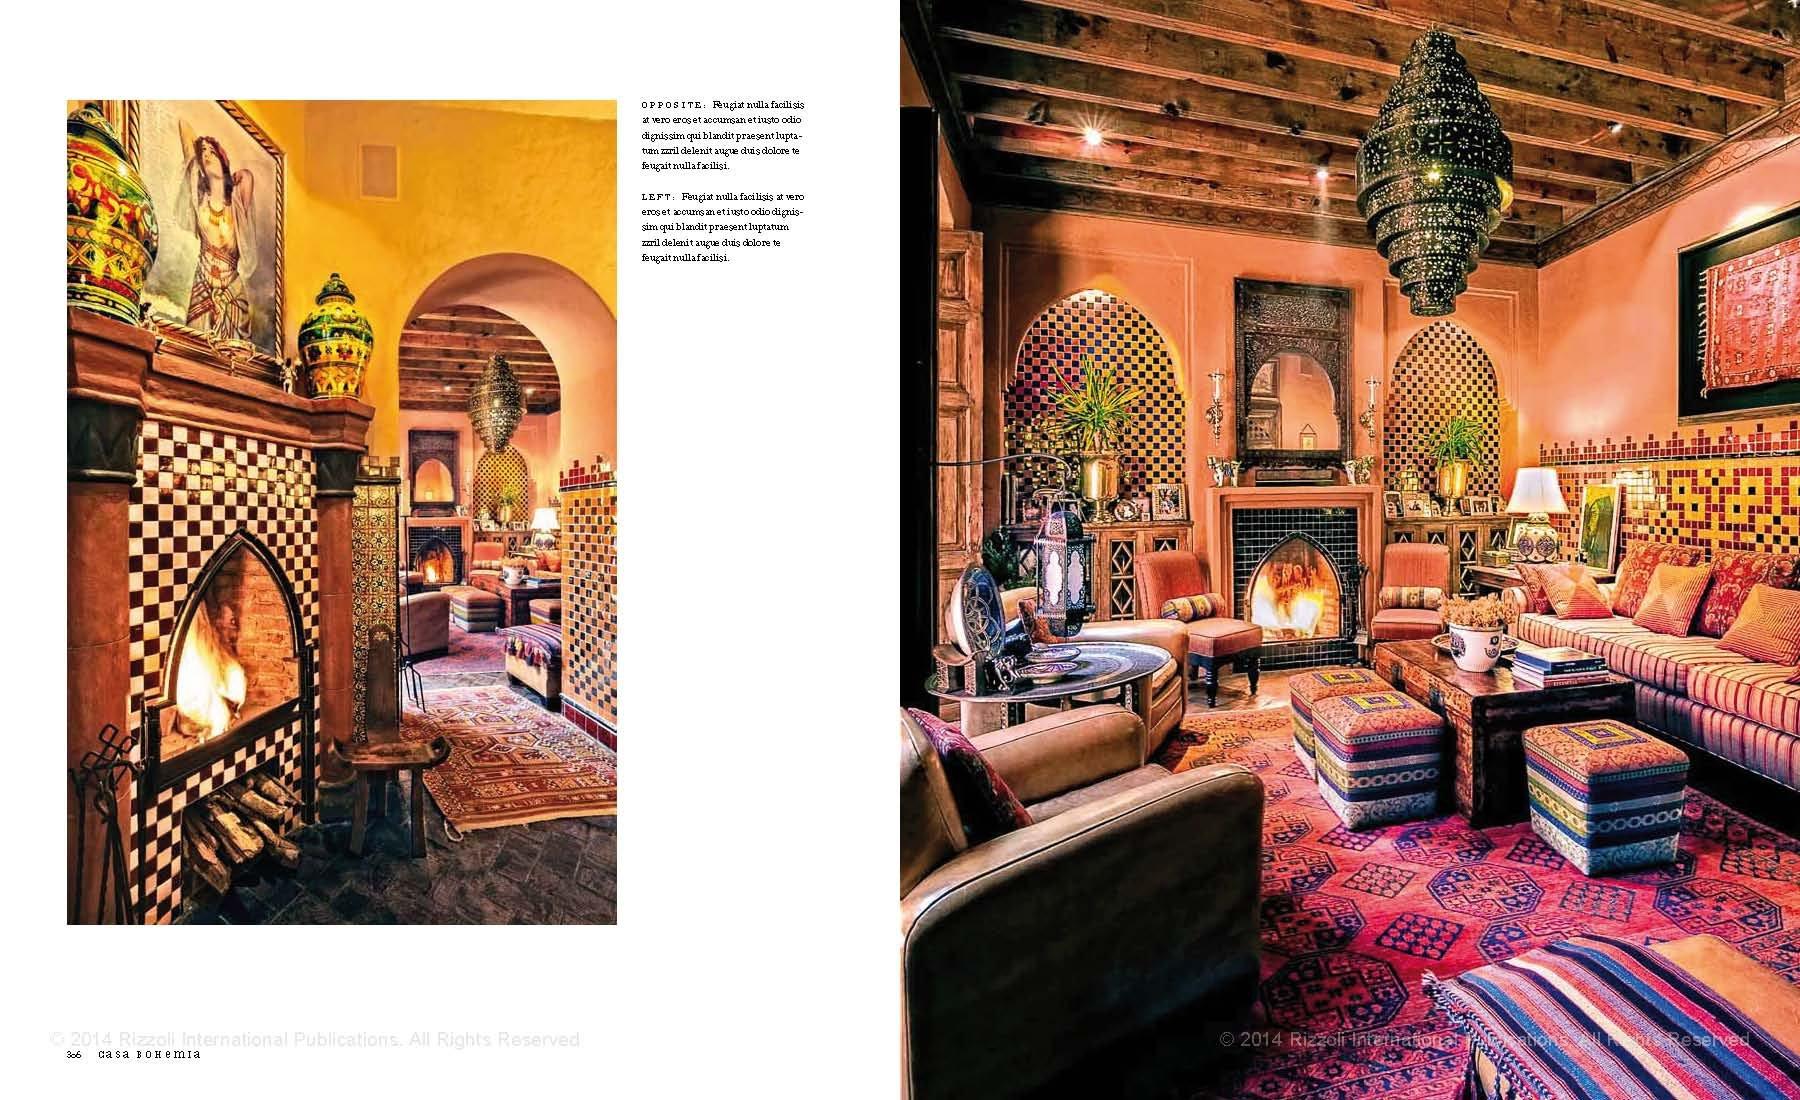 Casa Bohemia The Spanish Style House Linda Leigh Paul Ricardo Vidargas 9780789327536 Amazon Books